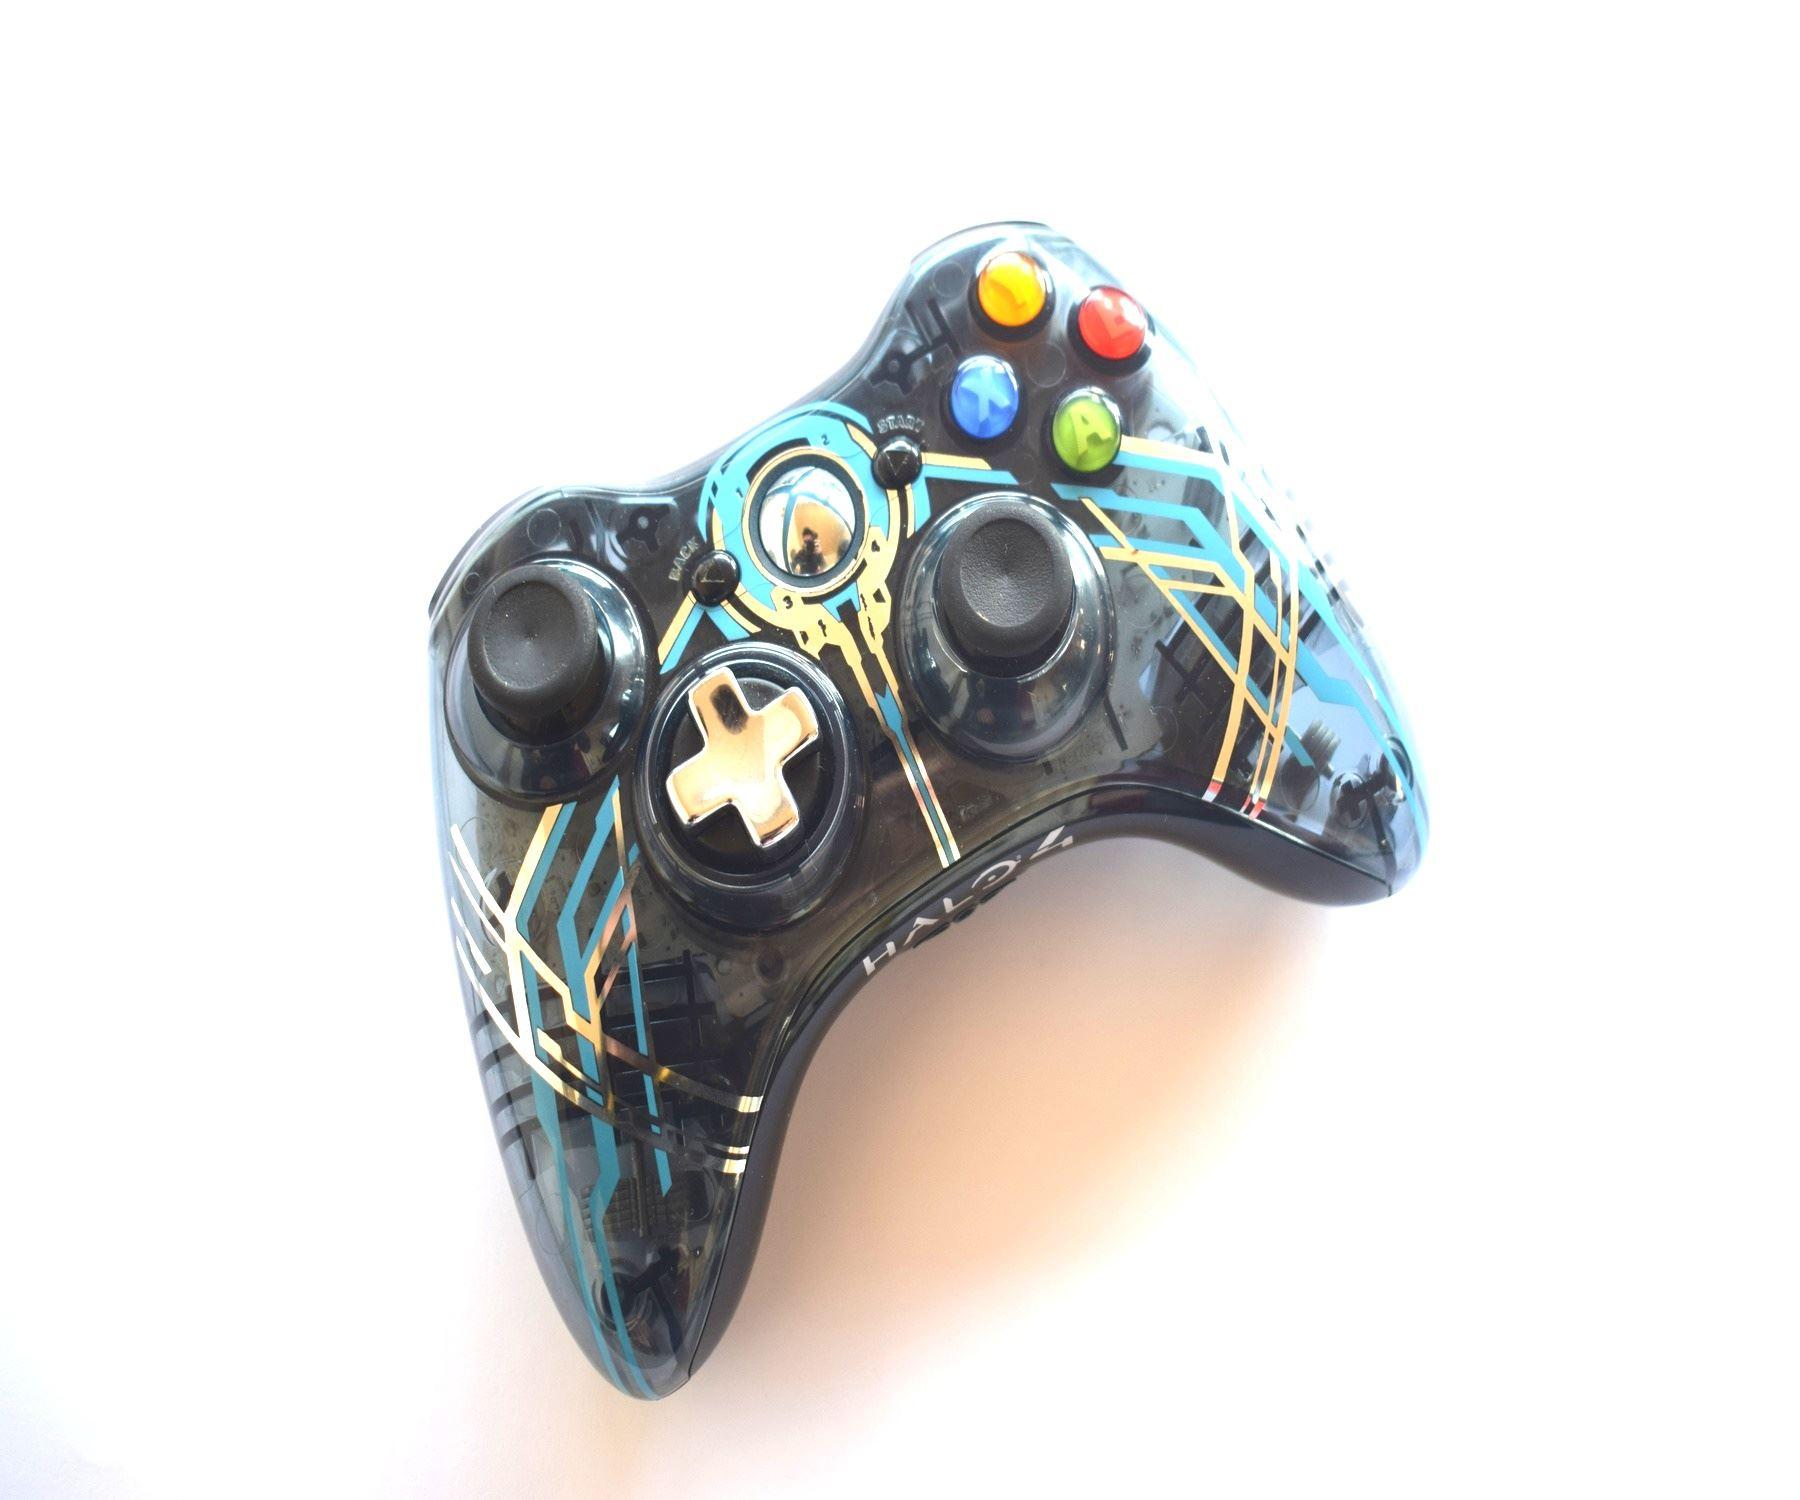 Official-Original-Genuine-Microsoft-Xbox-360-Controller-Pads-Various-Colours thumbnail 38